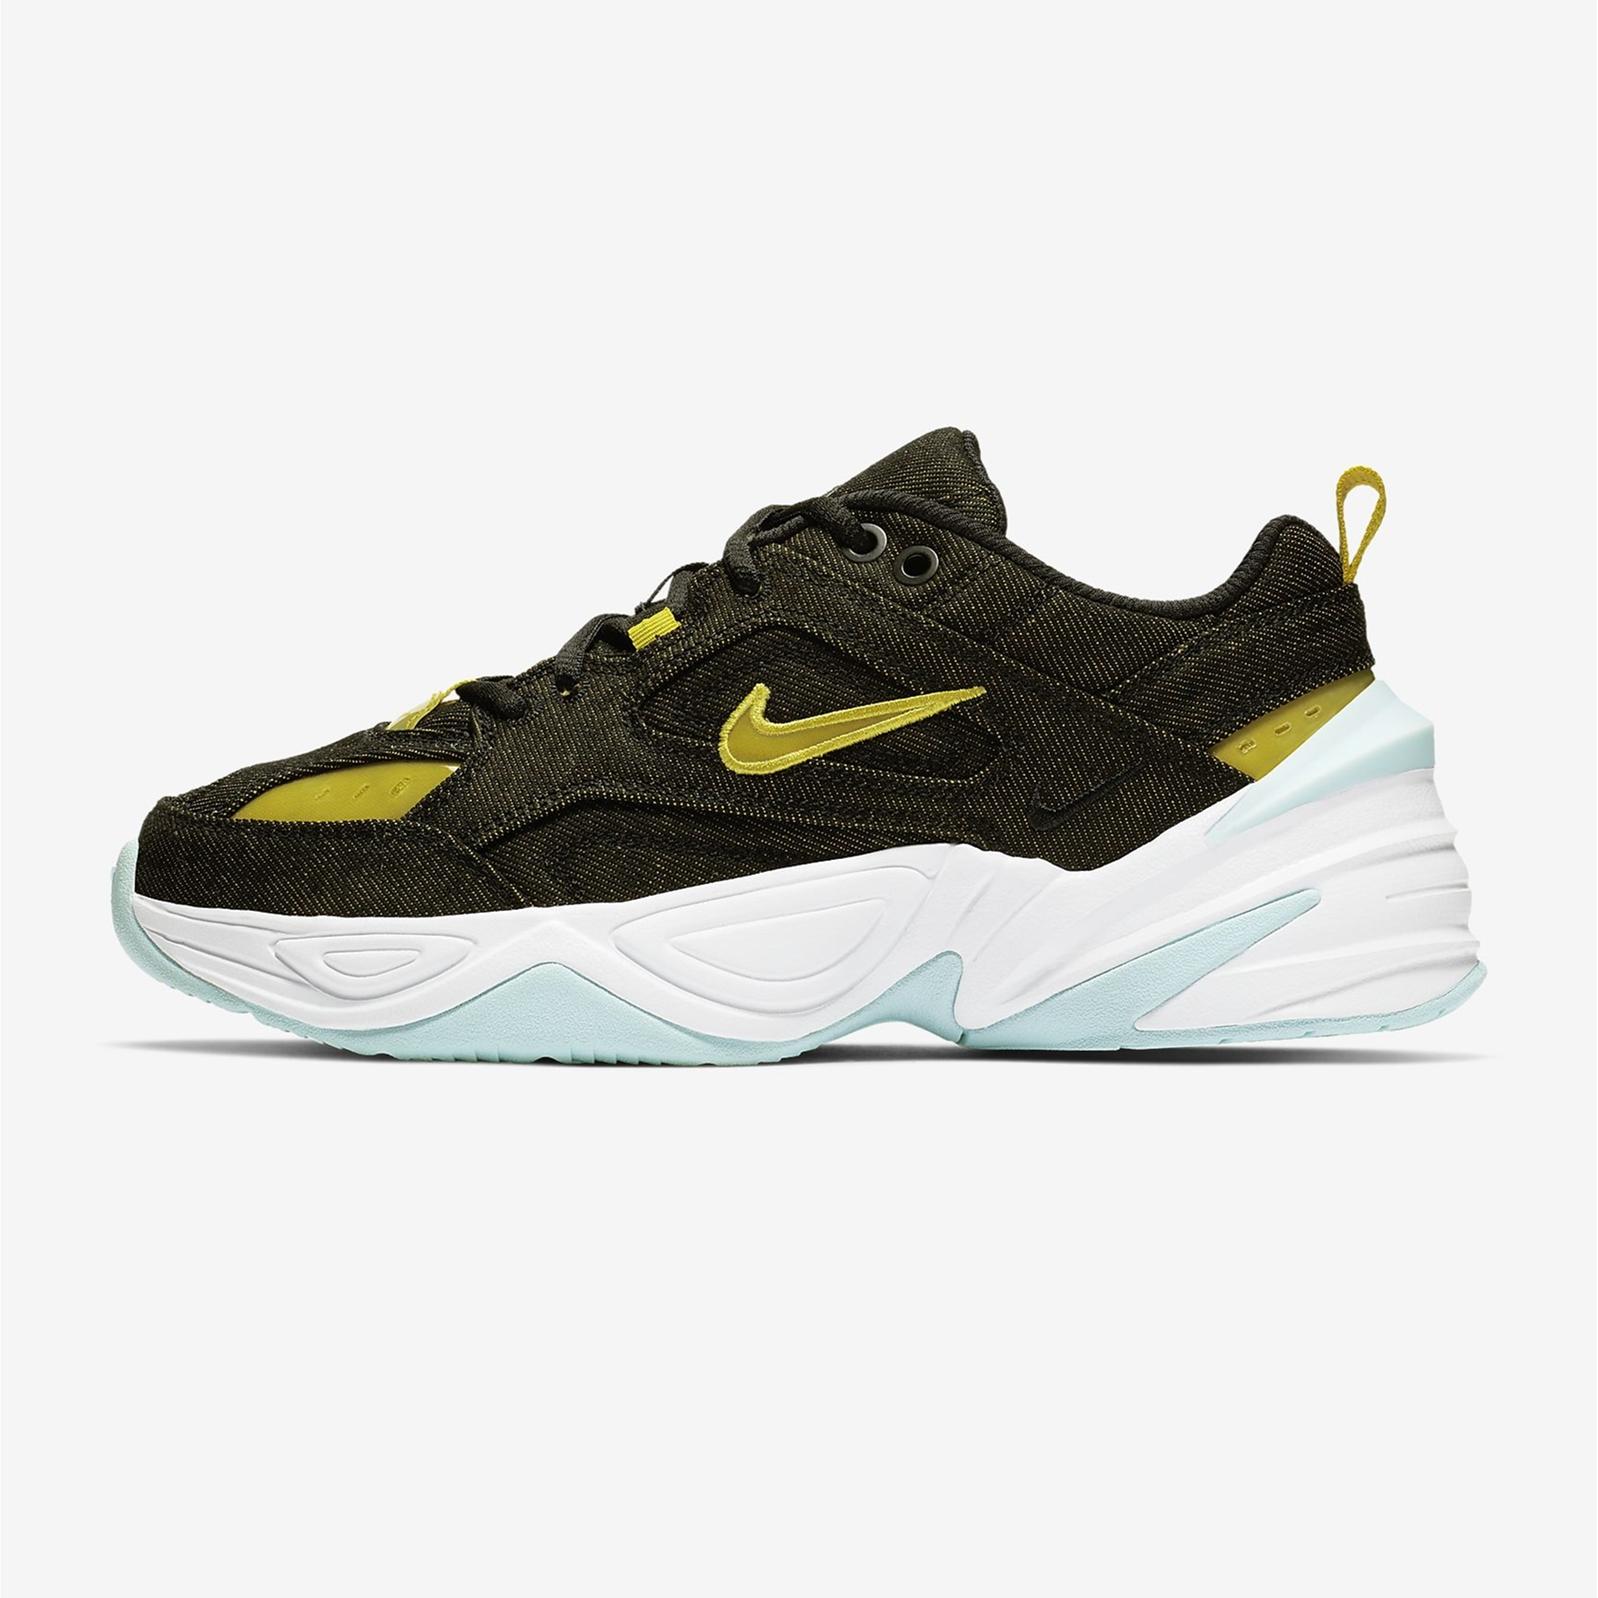 Nike 耐克 M2K Tekno LX 拼色女子运动鞋